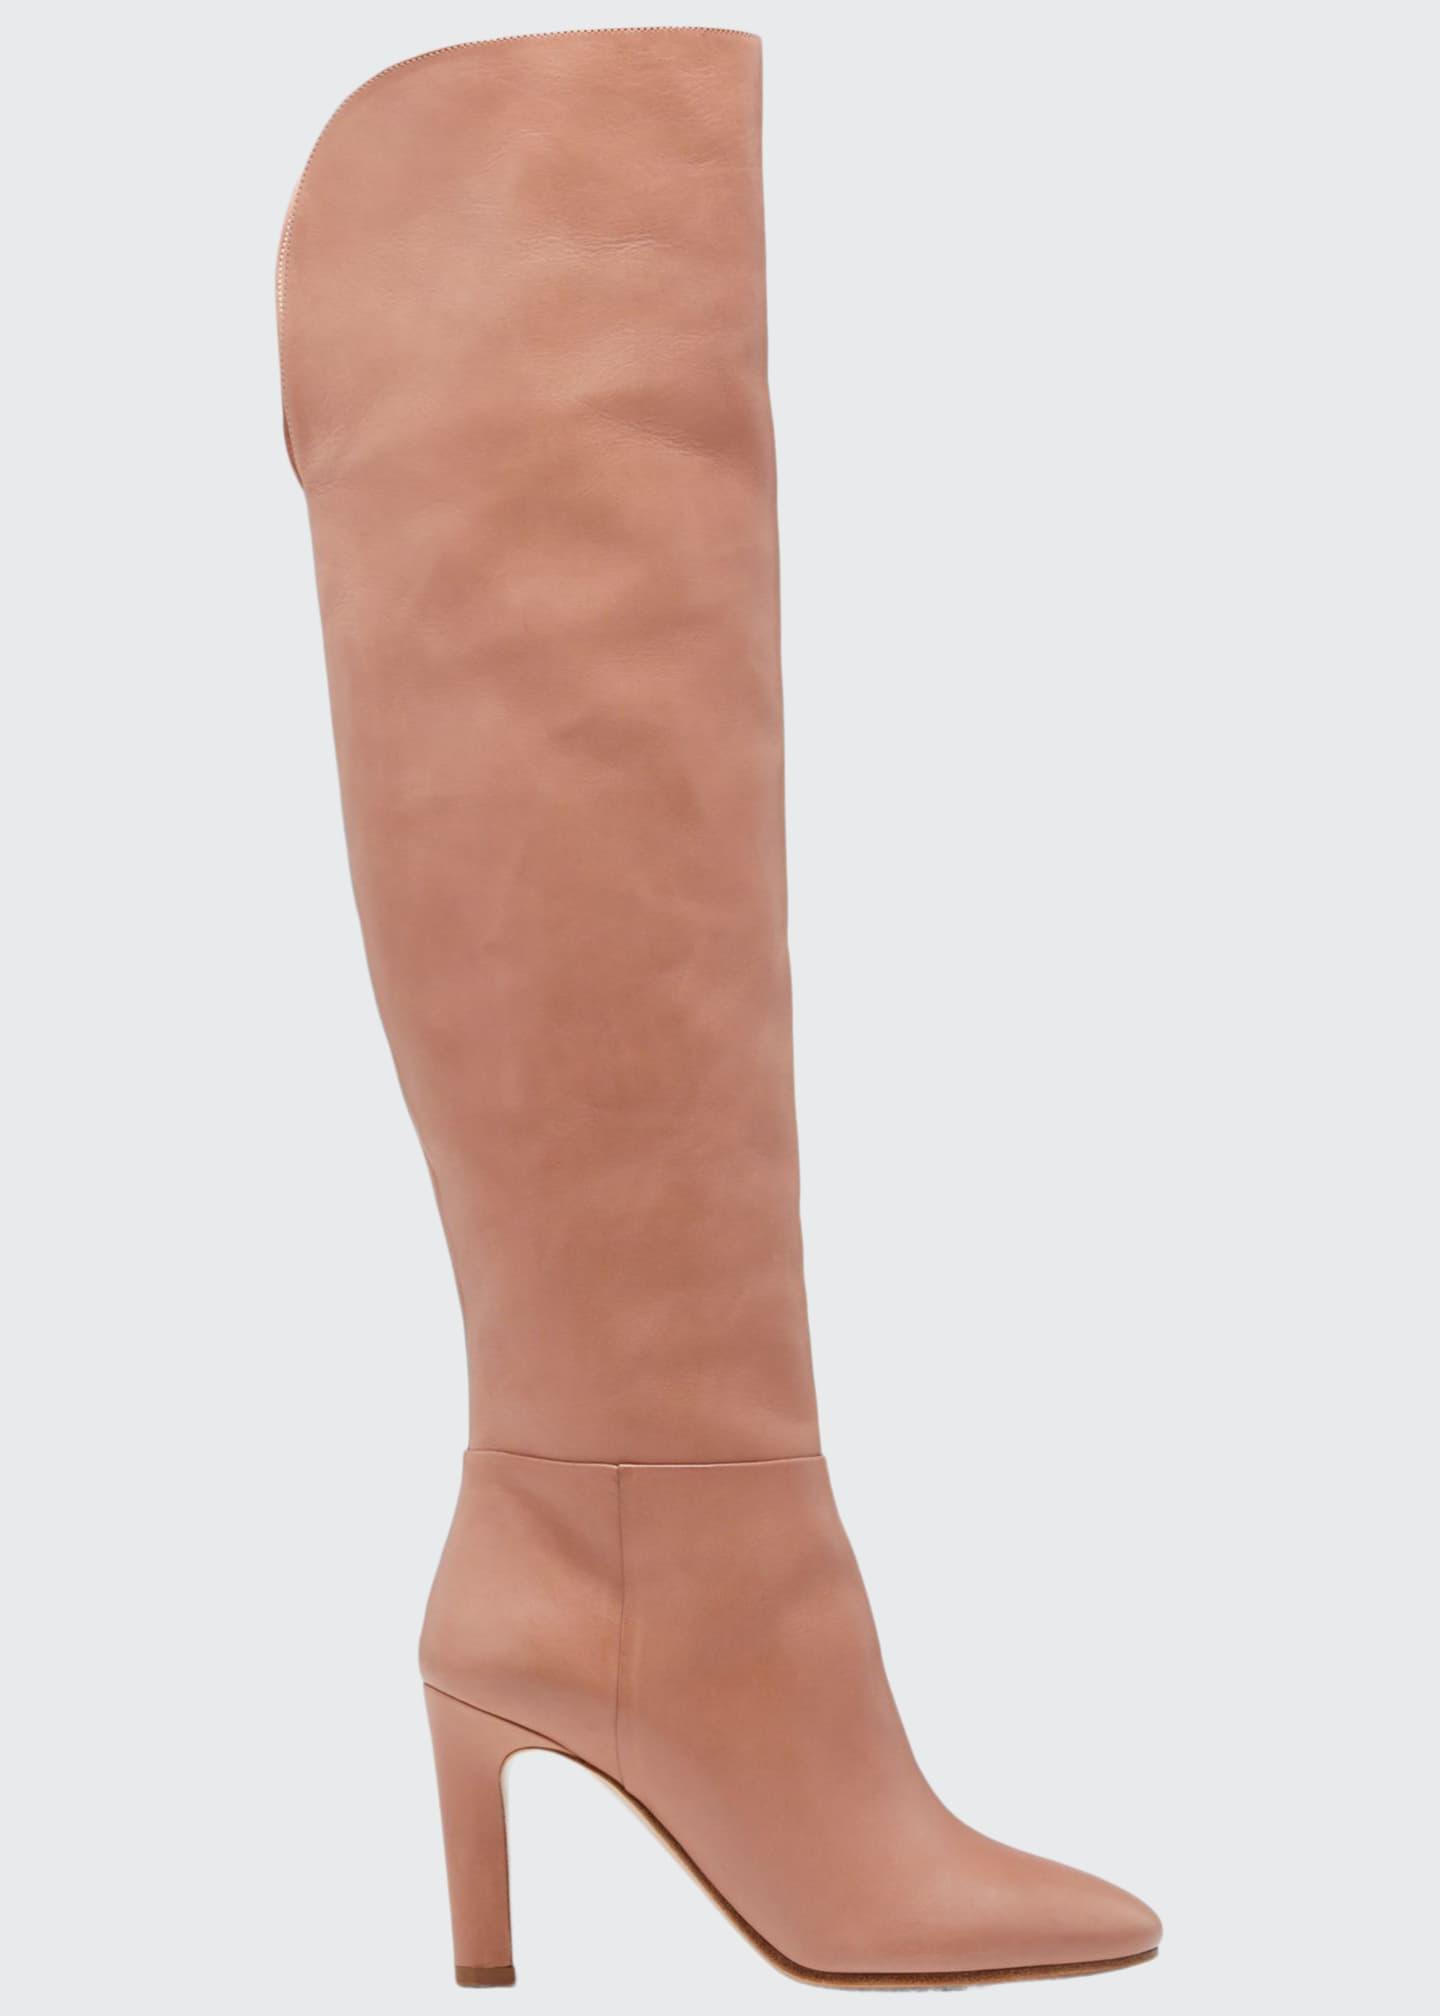 Gabriela Hearst Linda Leather Knee Boots